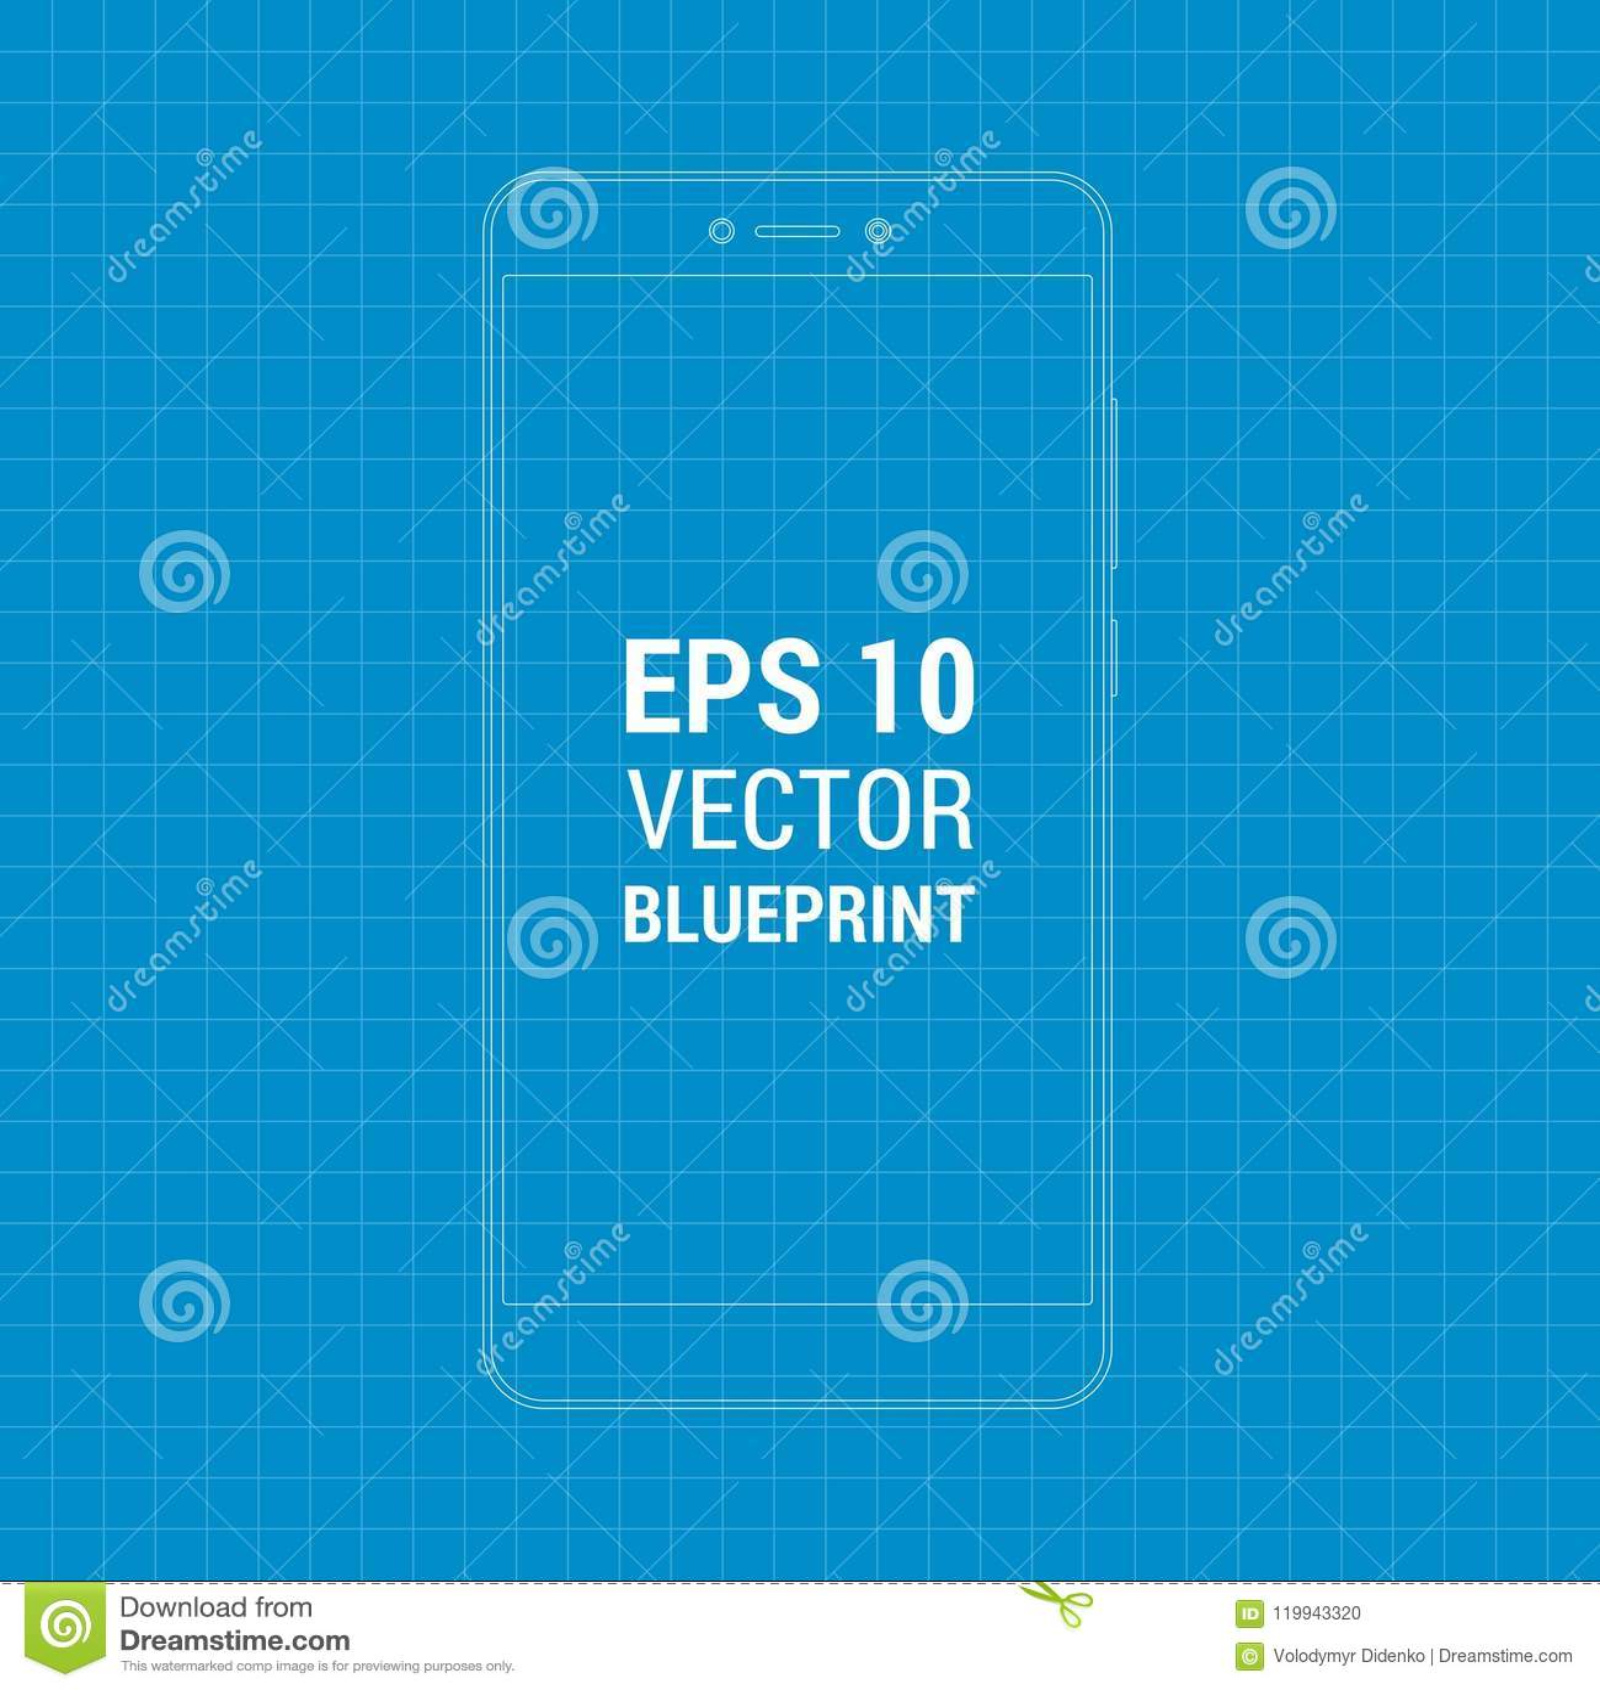 Blueprint Outline Flat Mock-up Xiaomi Redmi Note 4  Scale